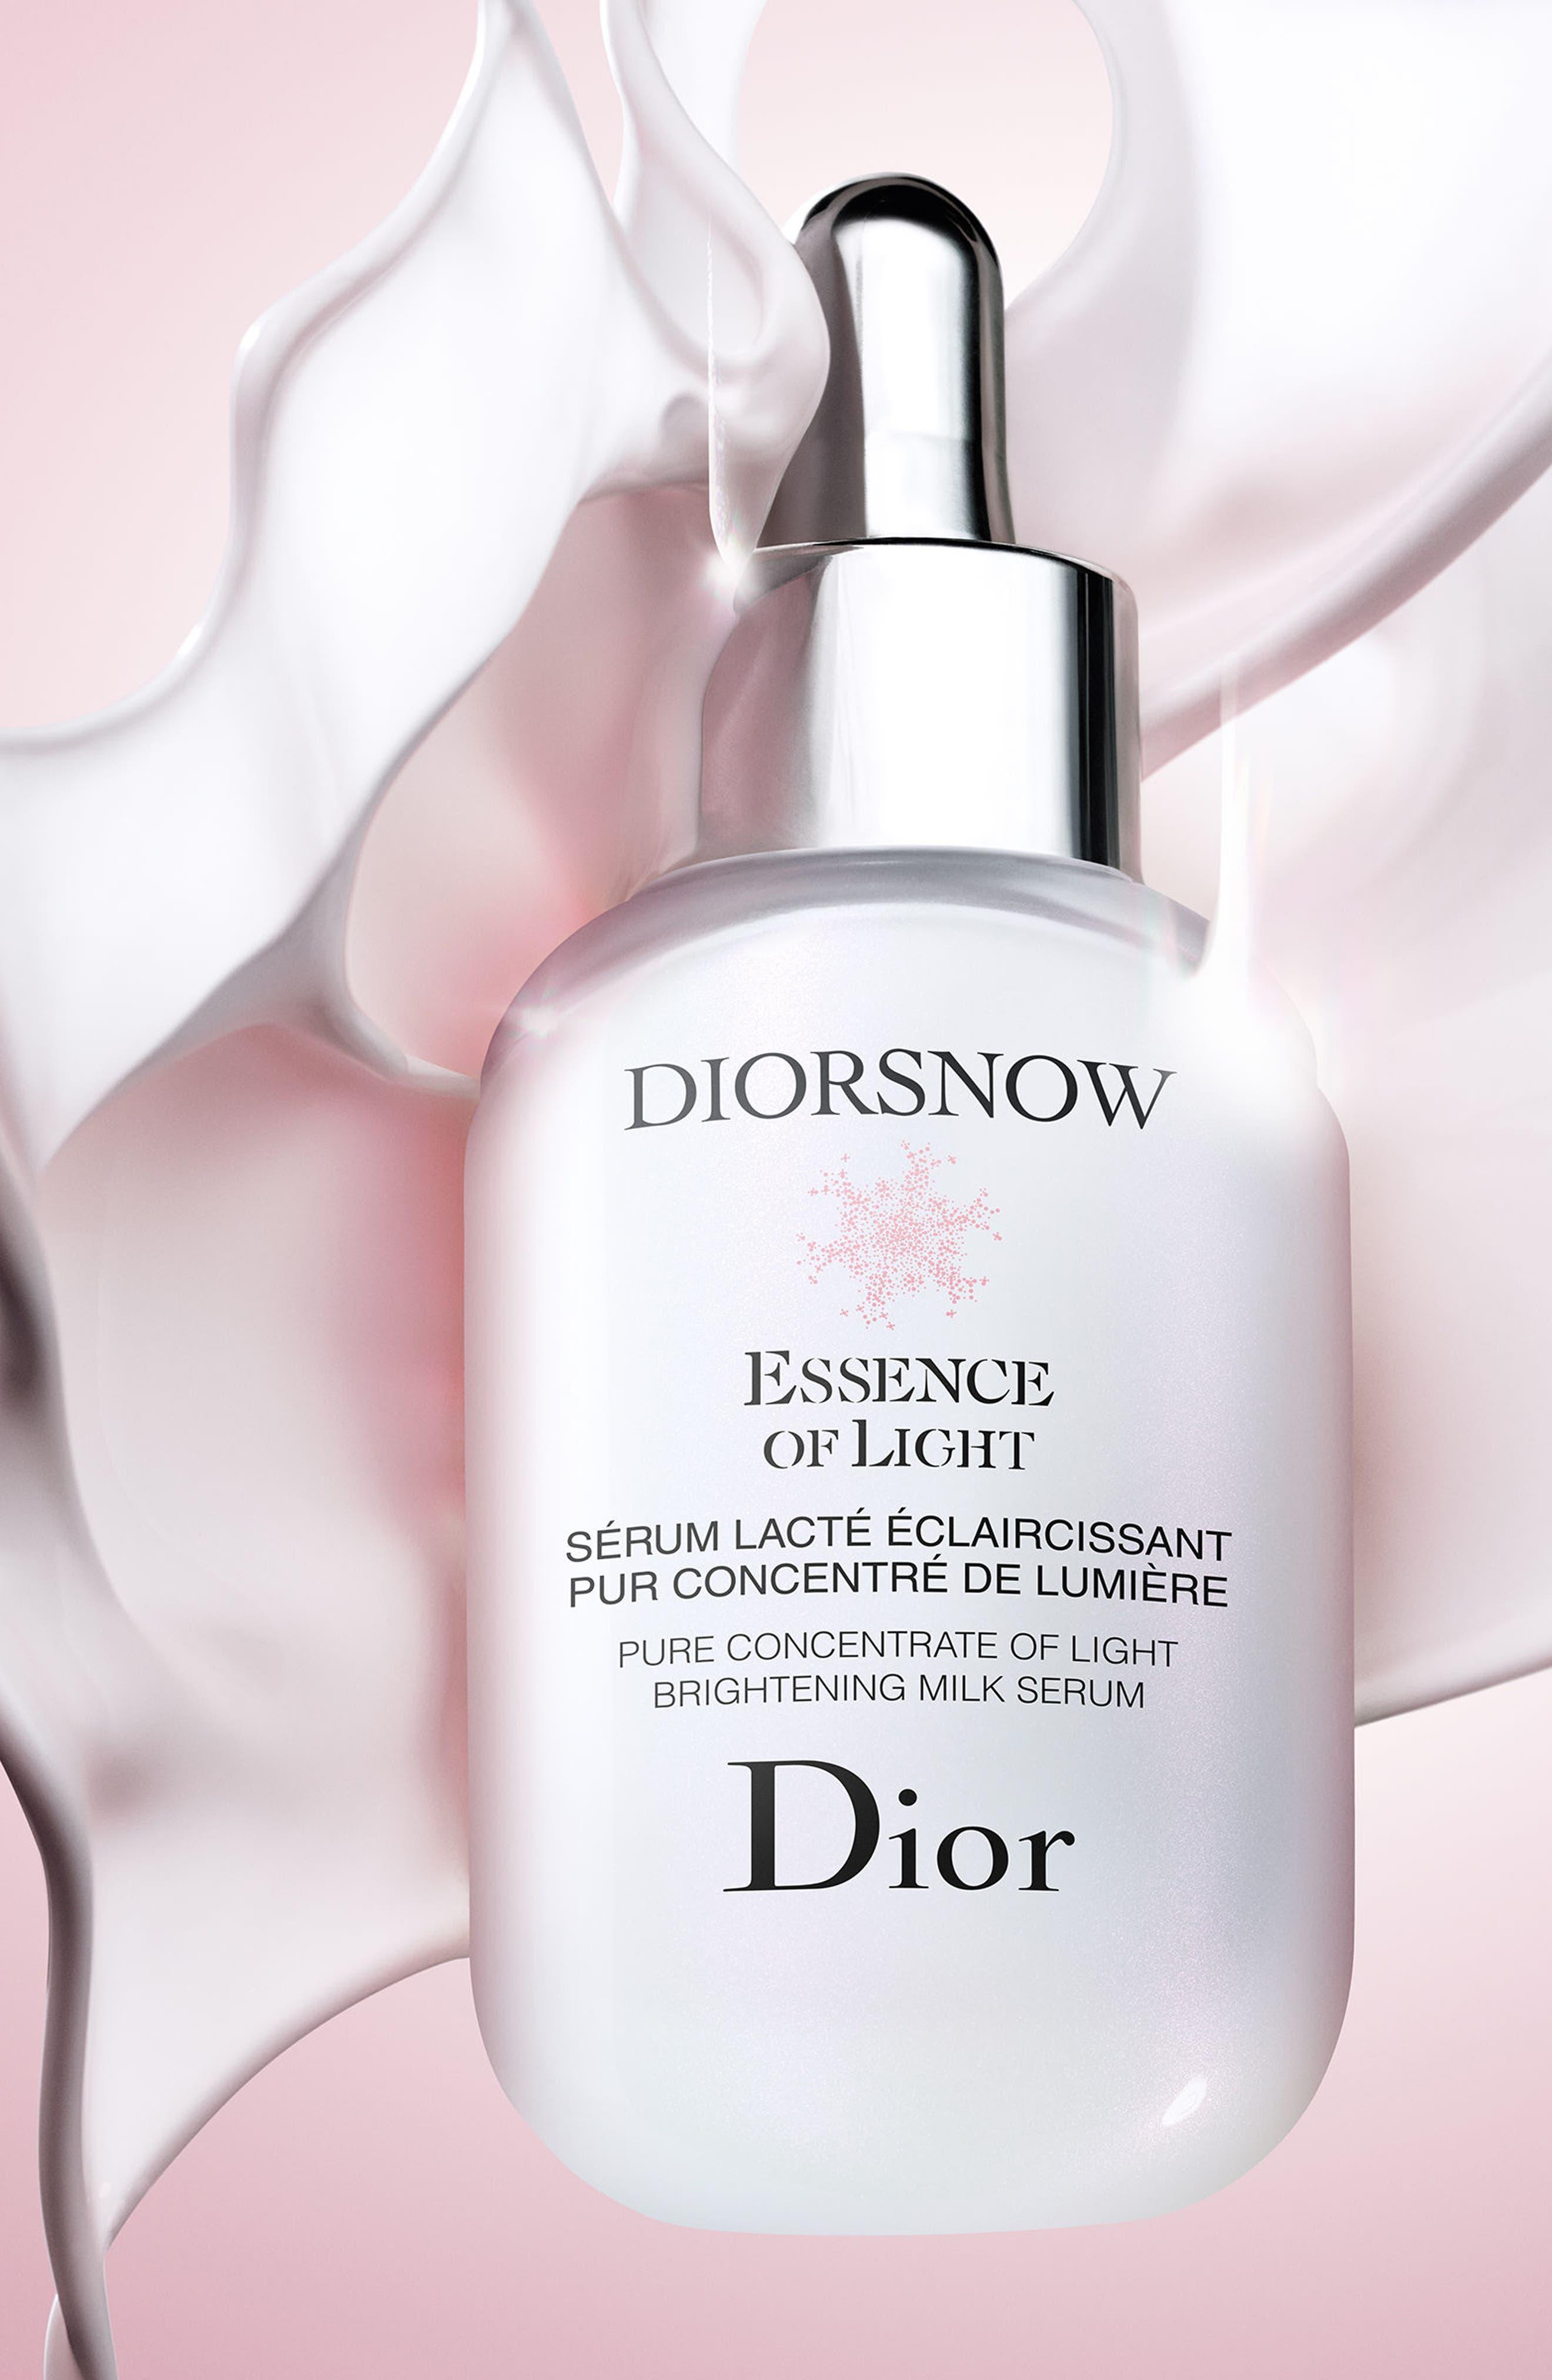 Diorsnow Essence of Light Brightening Milk Serum,                             Alternate thumbnail 2, color,                             NO COLOR